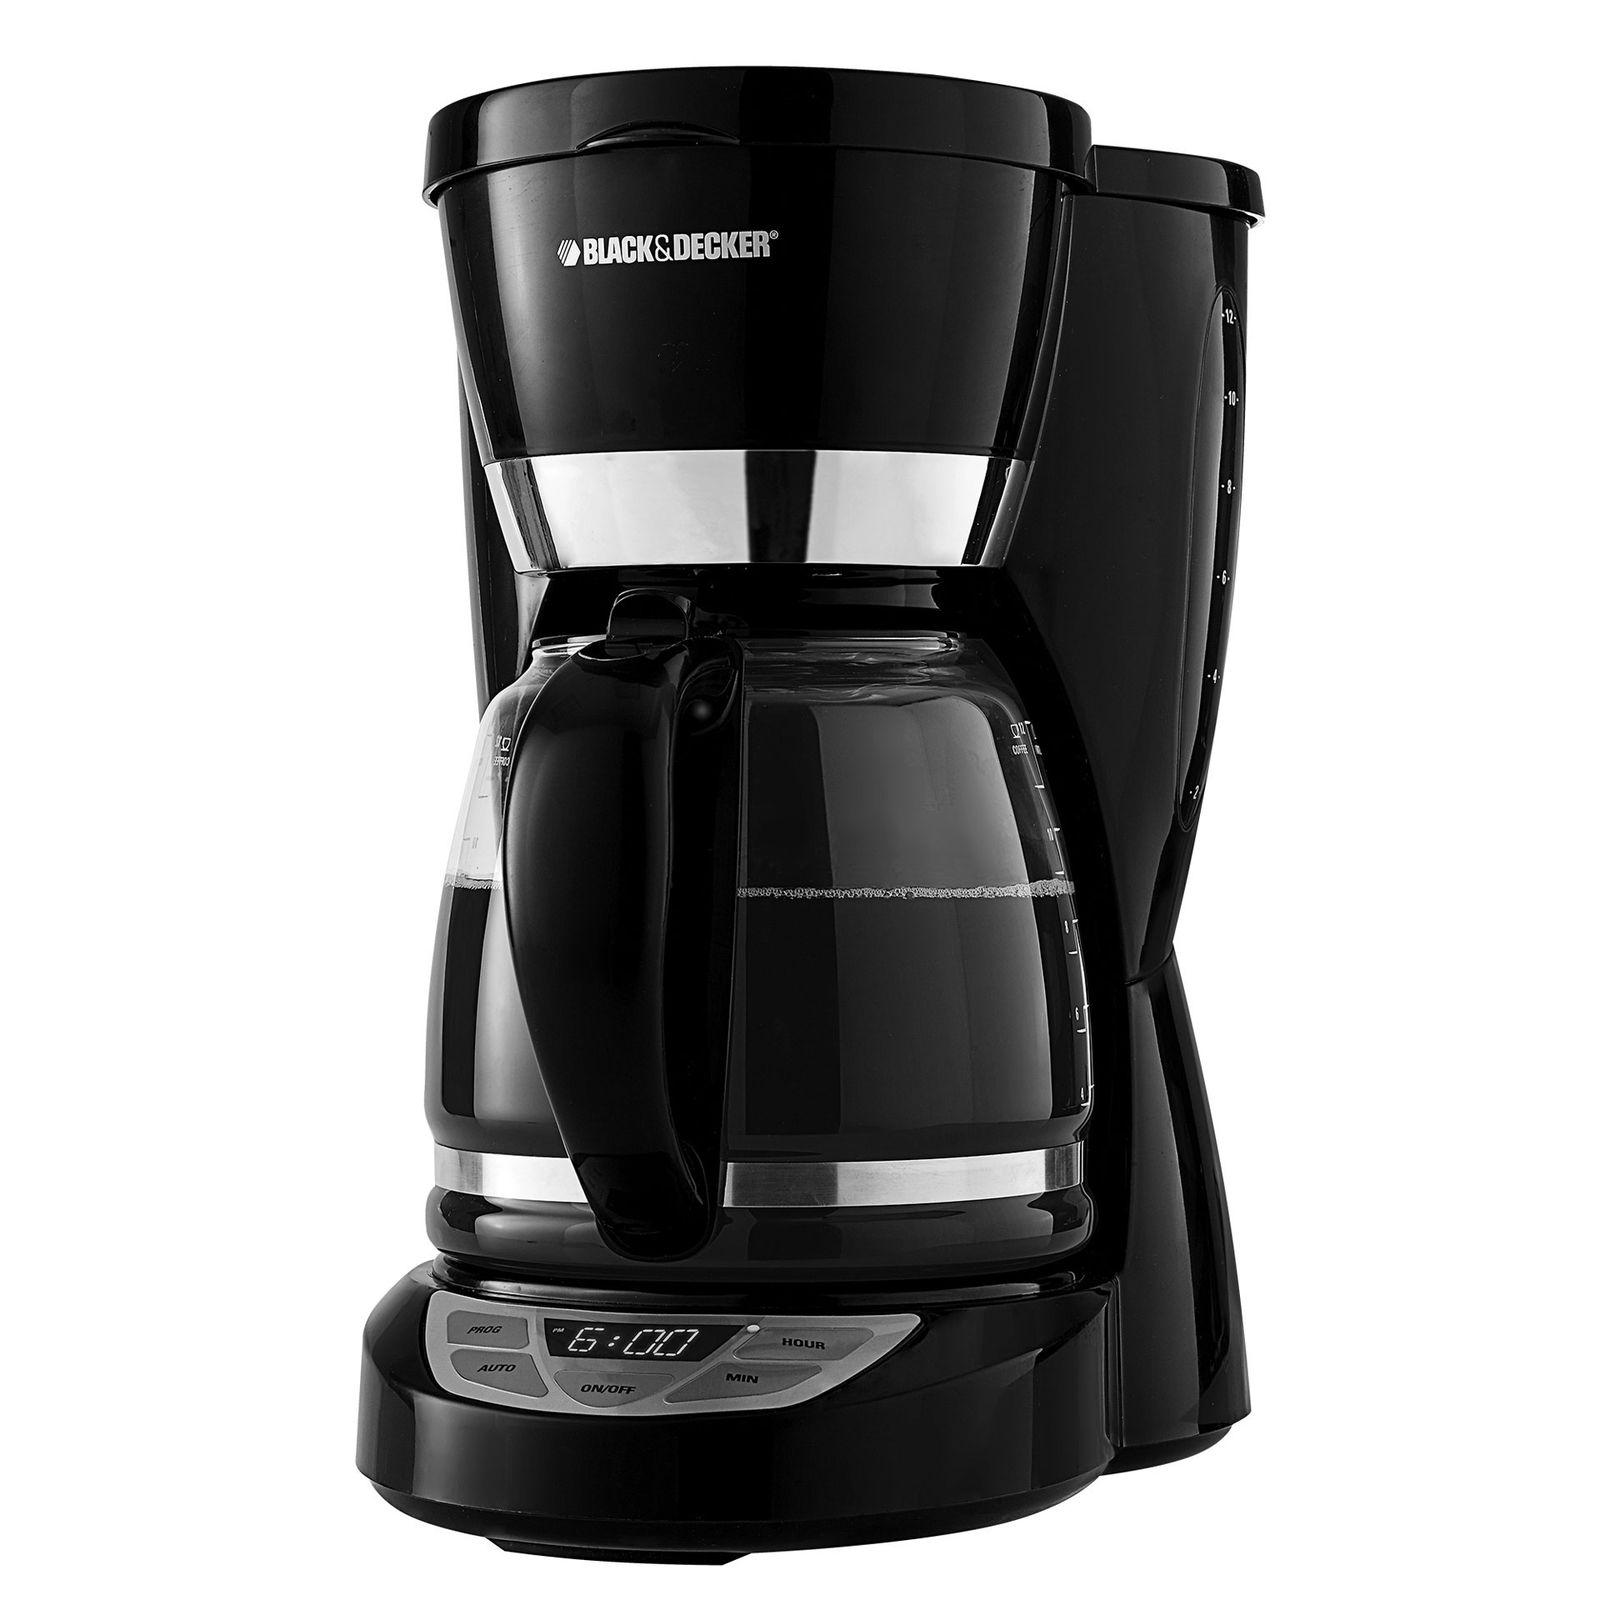 Black & Decker 12-Cup Programmable Coffee Maker #CM1050B Review